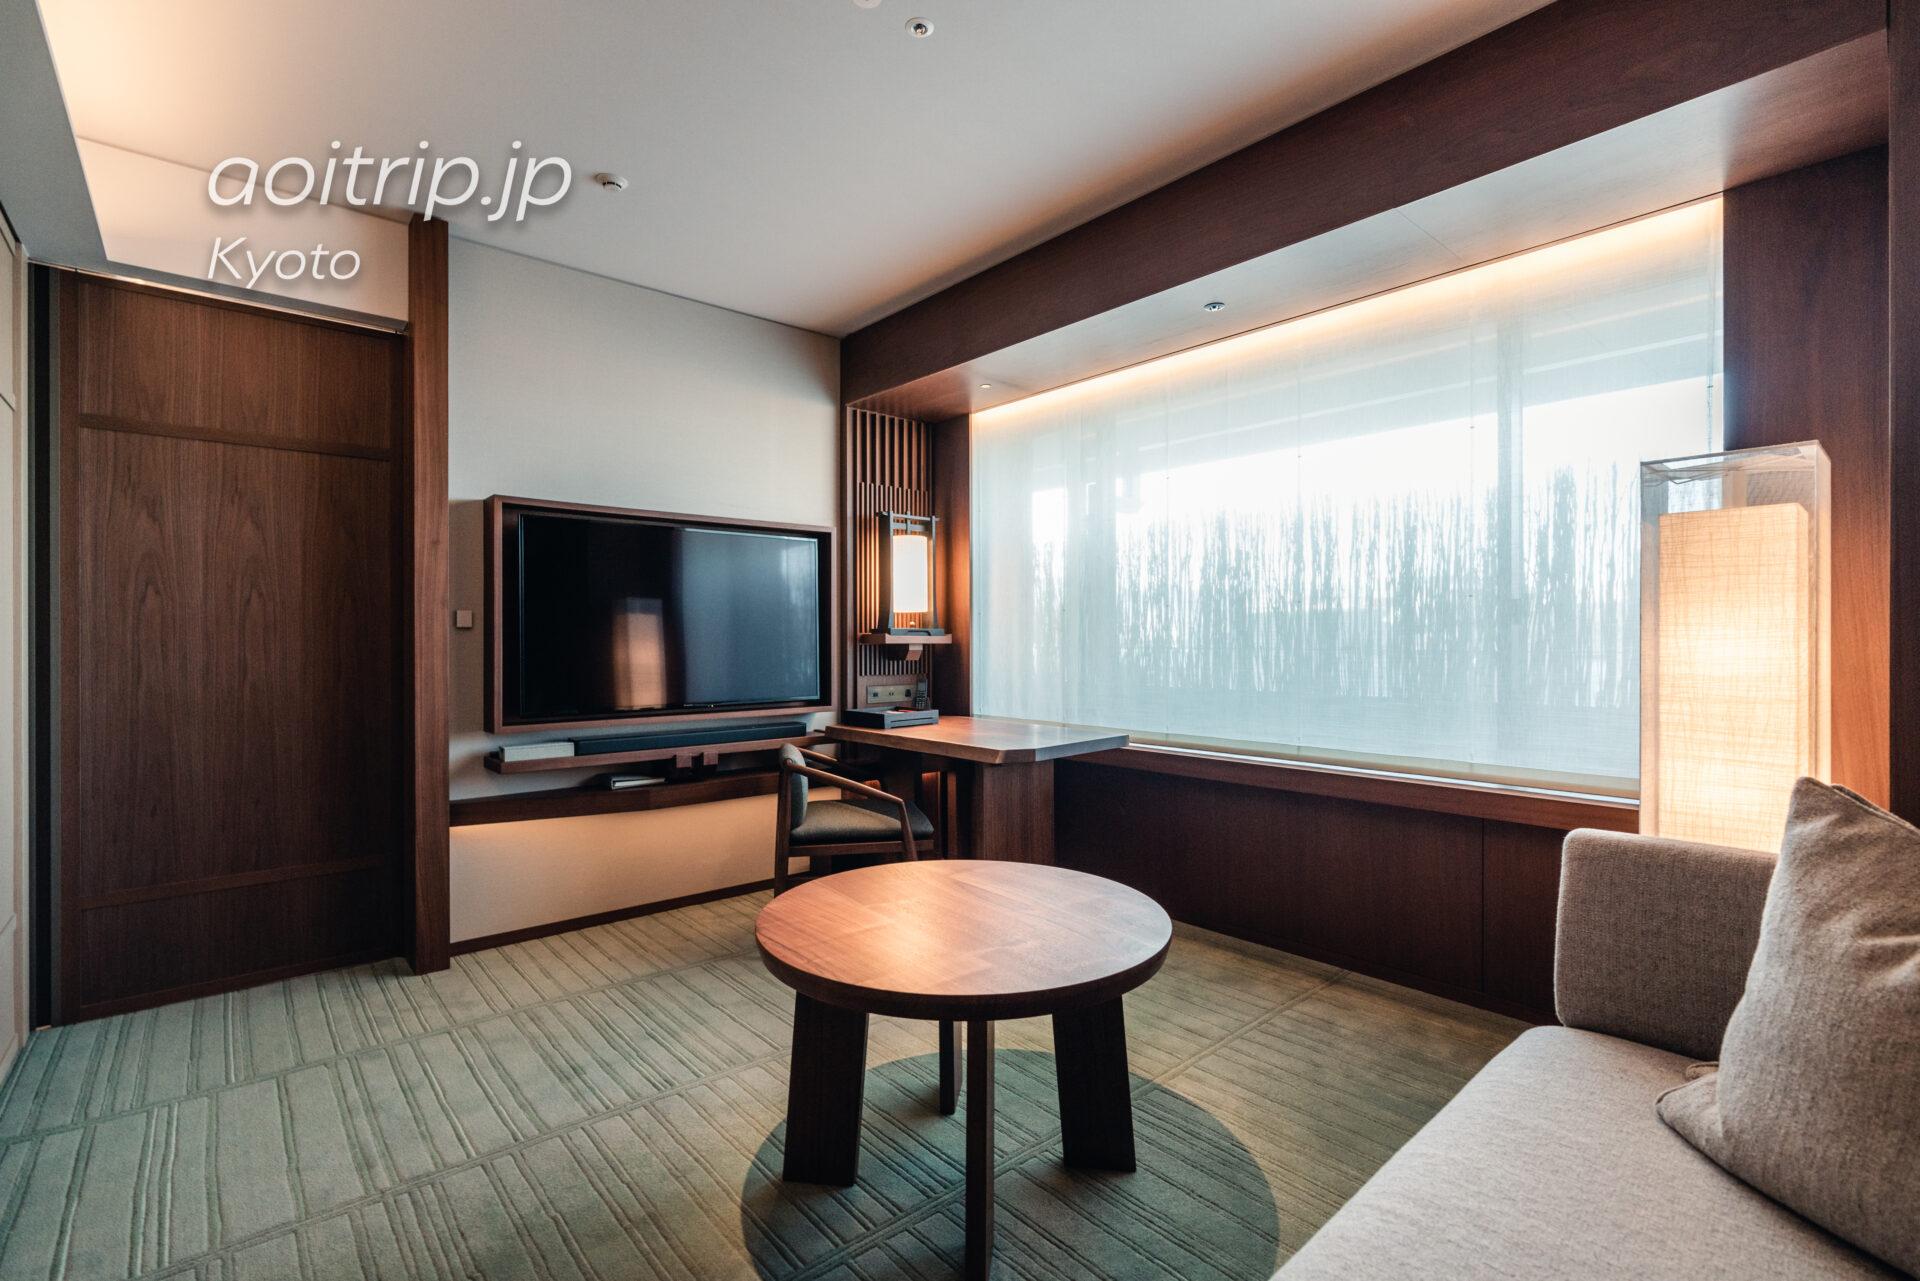 HOTEL THE MITSUI KYOTO デラックススイートの客室 Deluxe Suite